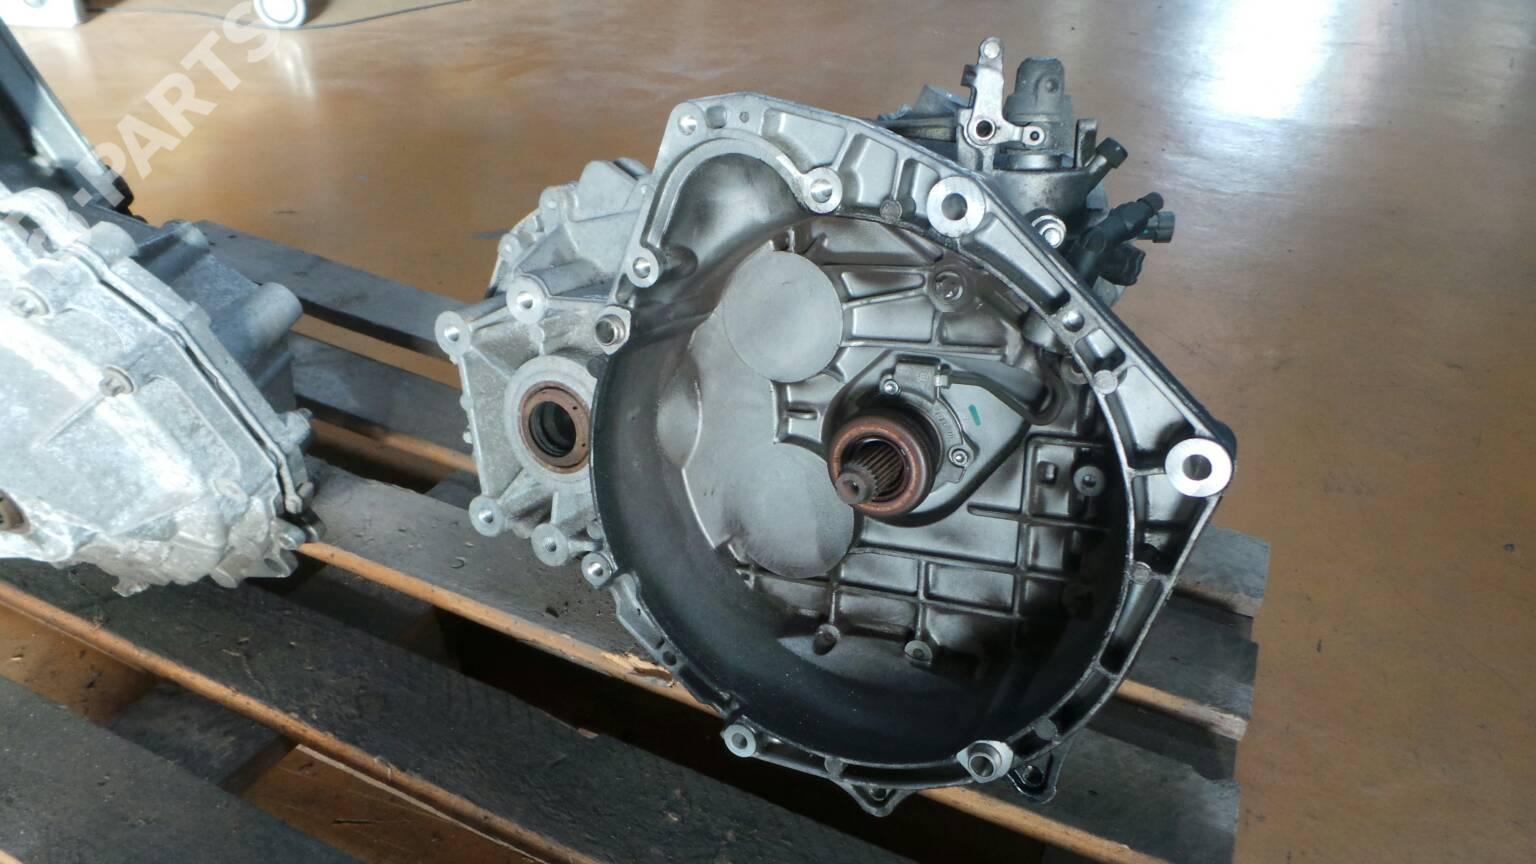 Manual Gearbox Saab 9 3 Ys3f 19 Tid 28361 2007 Engine Diagram R05088295f5 150hp